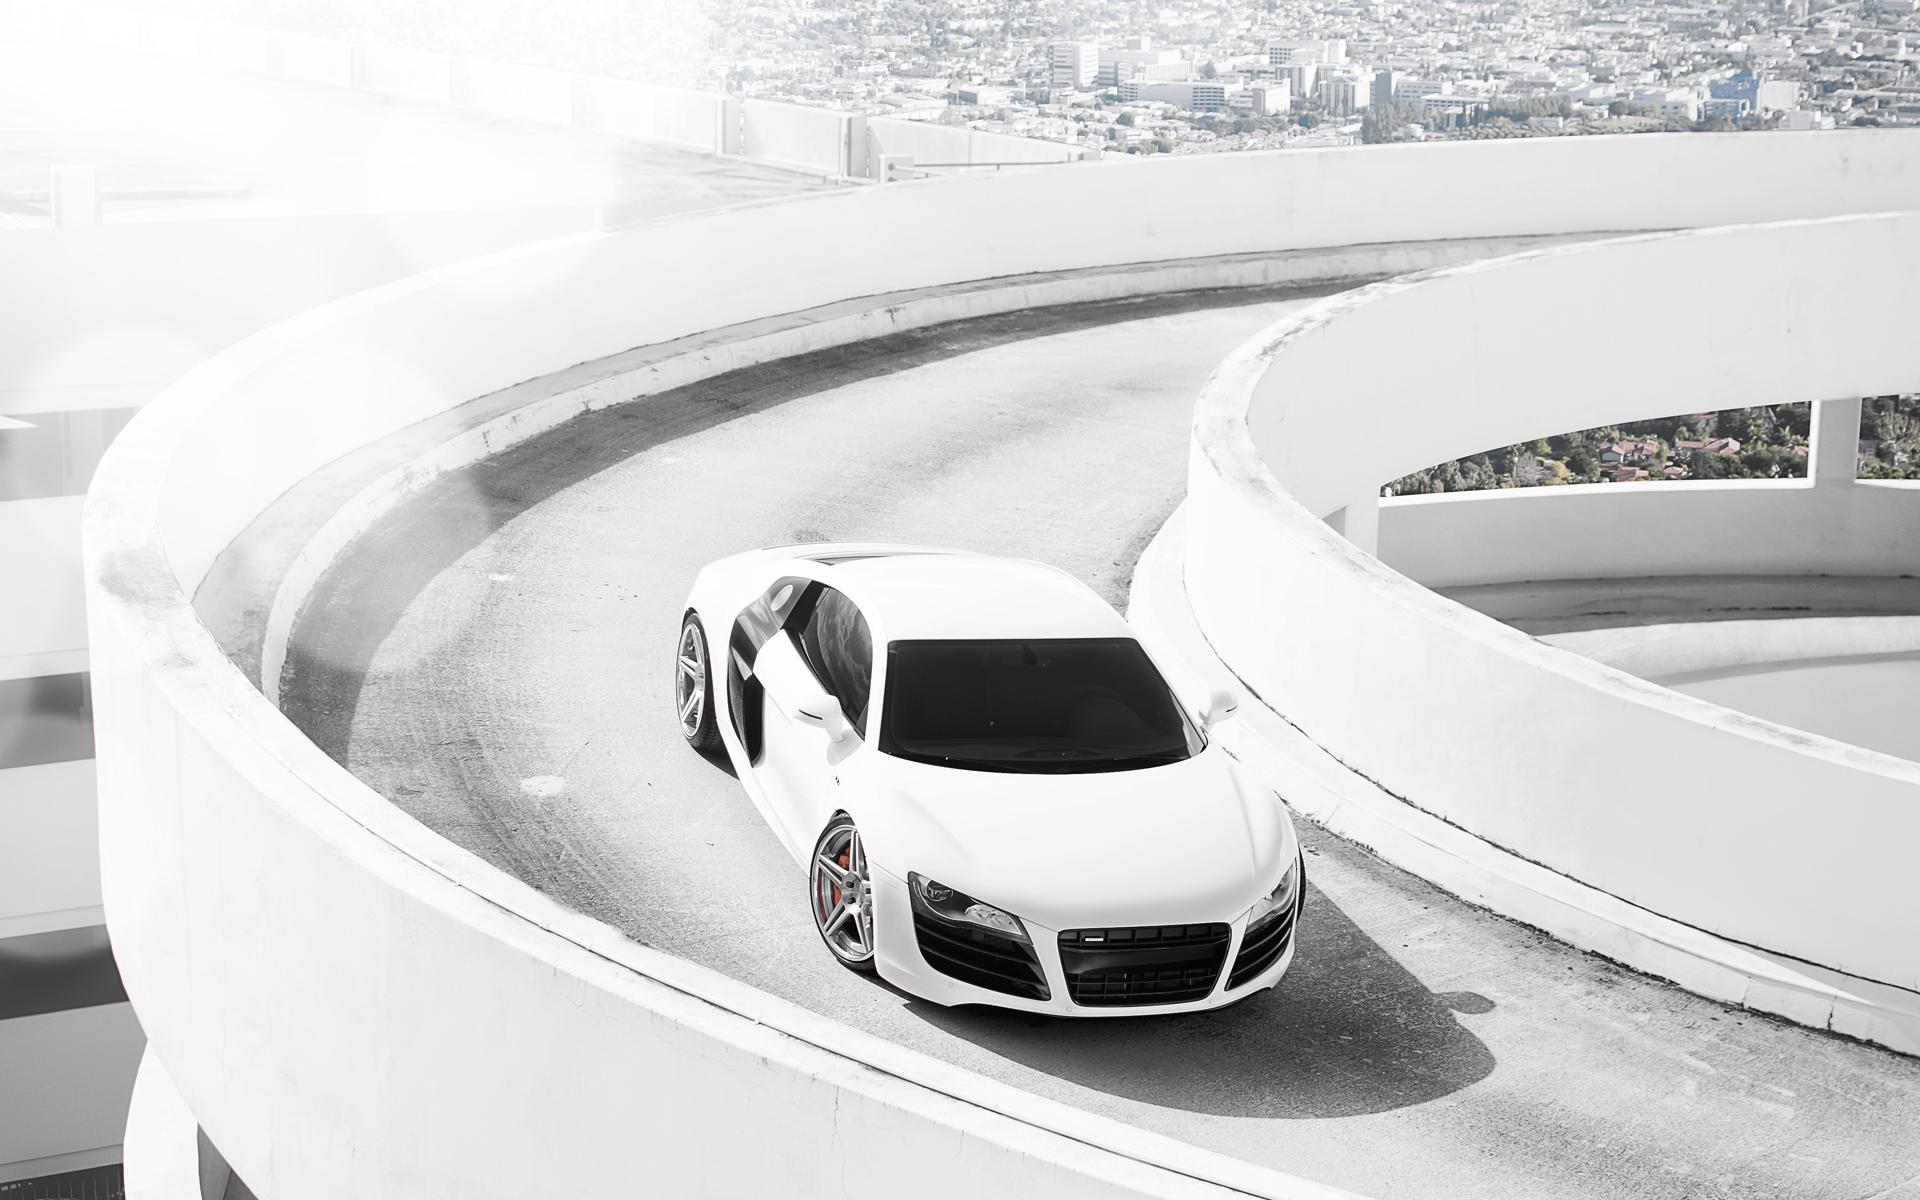 Car In Forrest Hd Wallpaper Audi R8 White Wallpaper Hd Car Wallpapers Id 2601